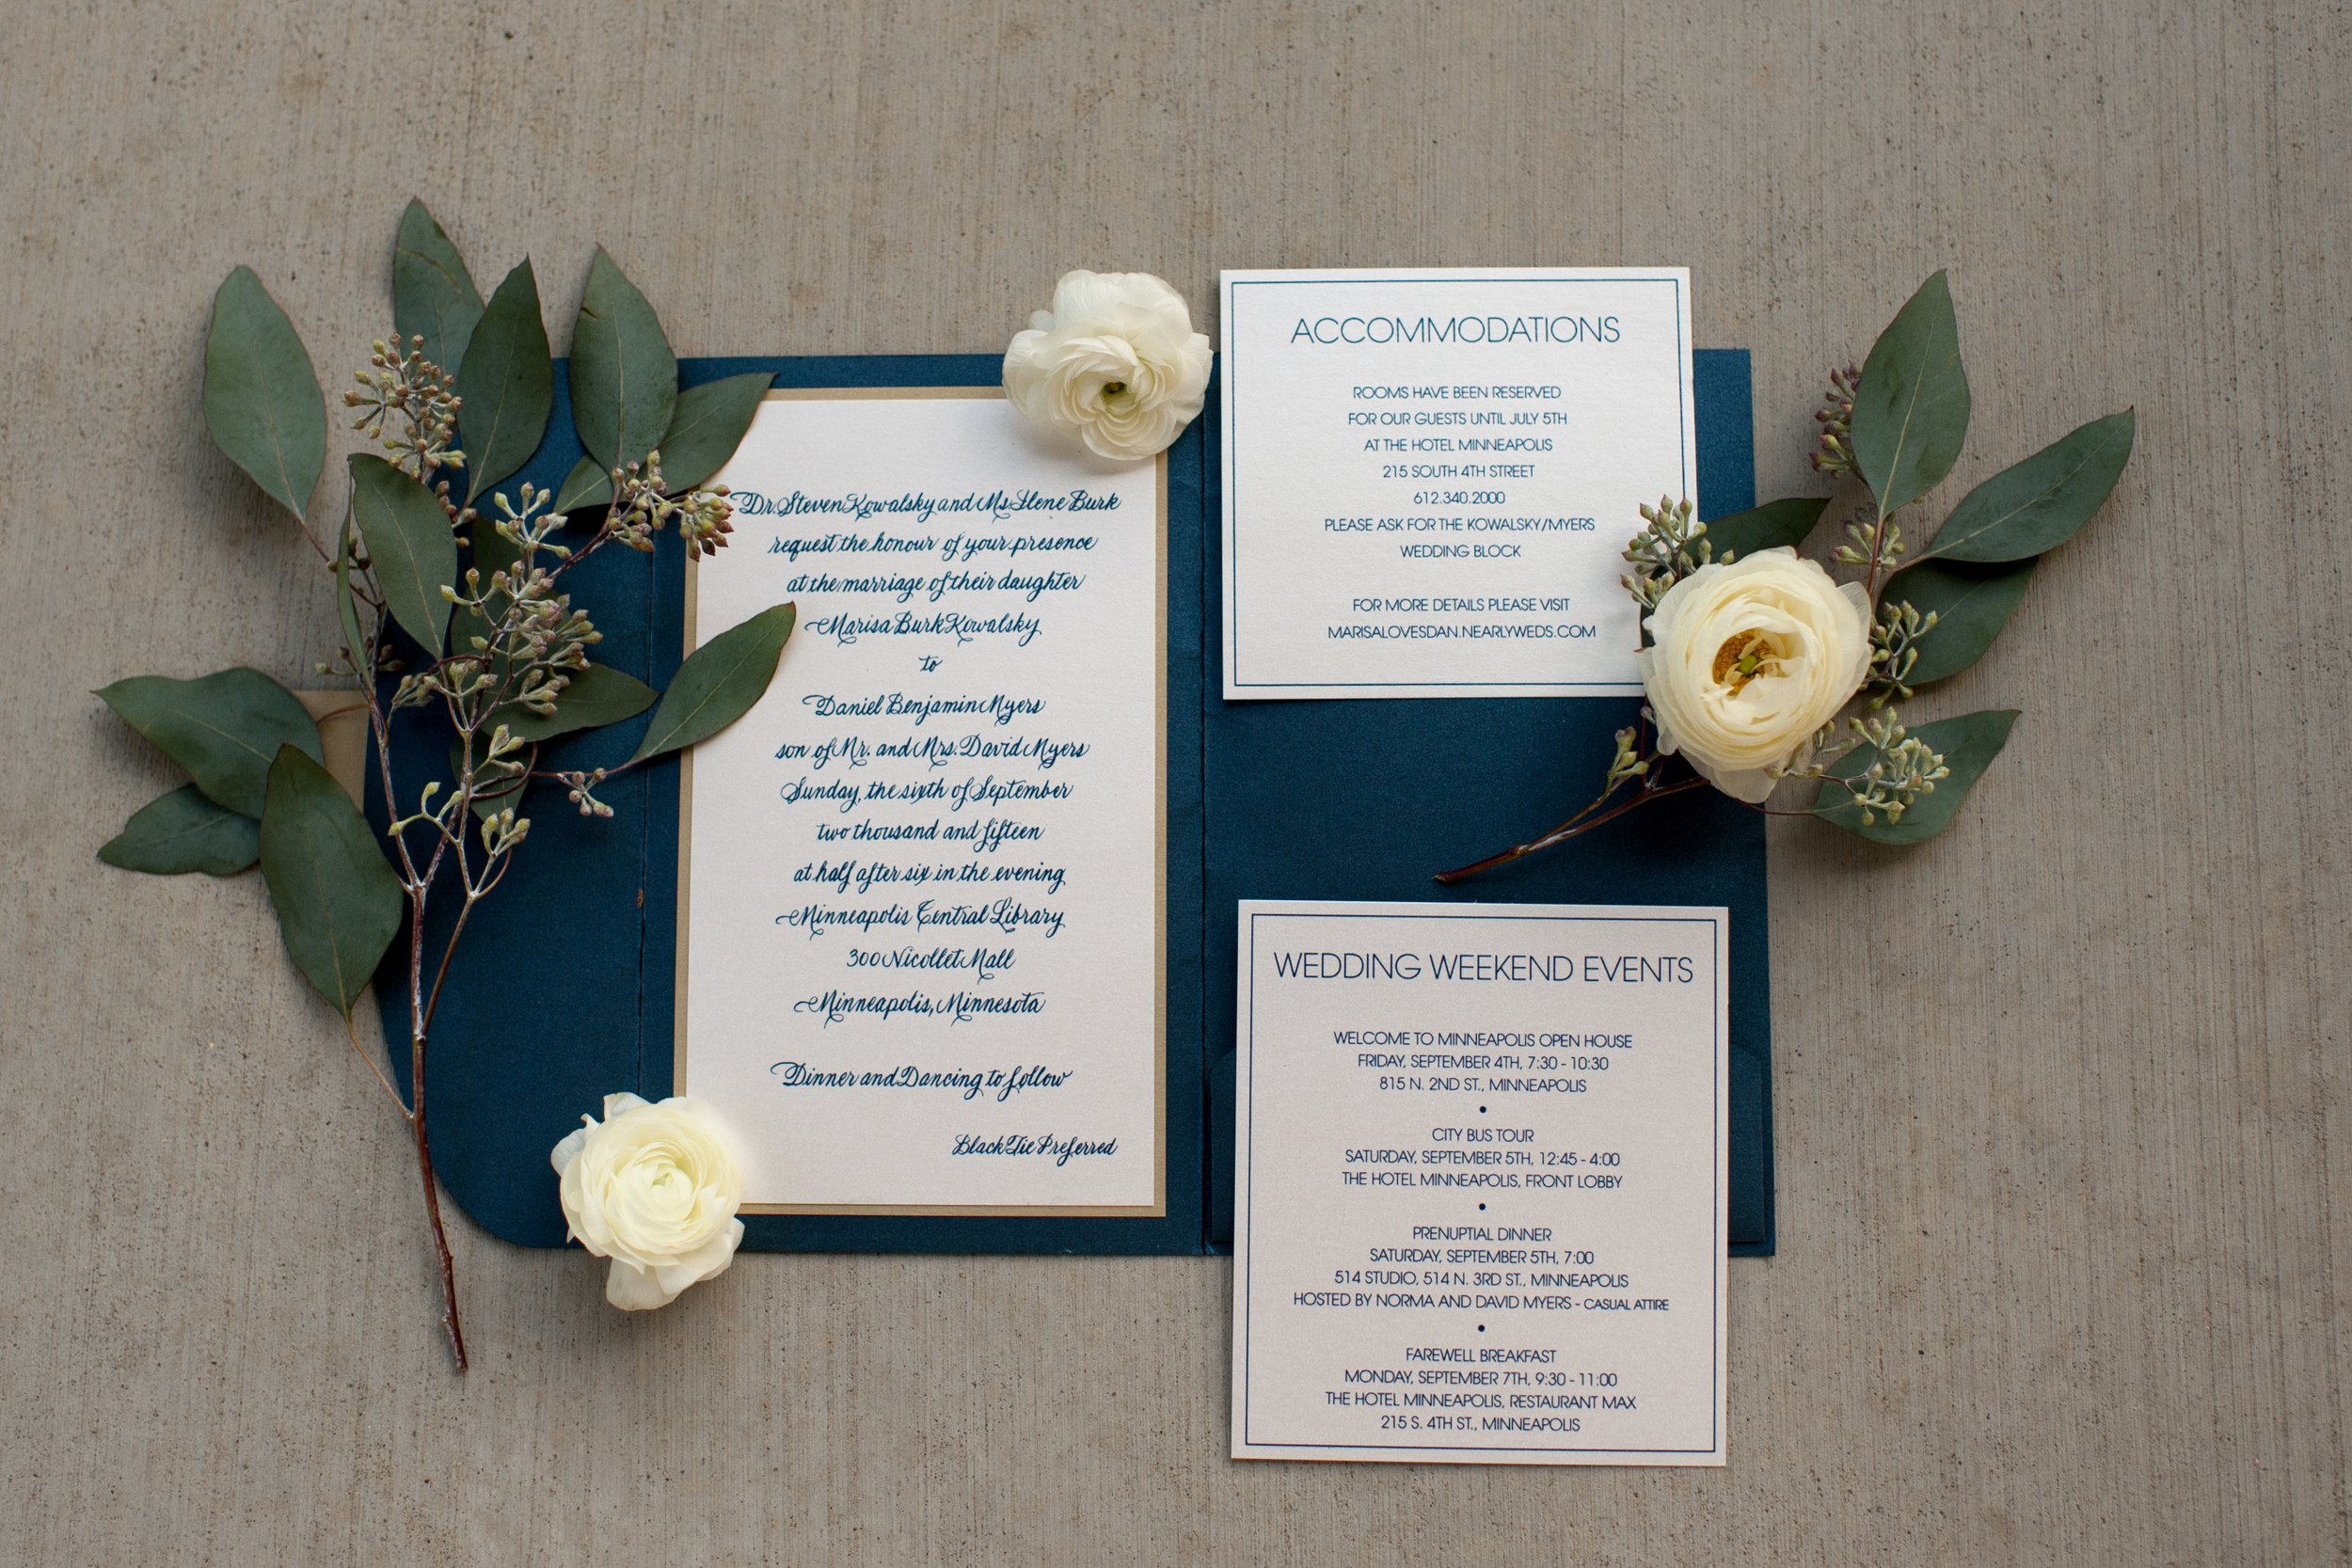 Acowsay_Cinema_MN_Wedding_Invites.jpg